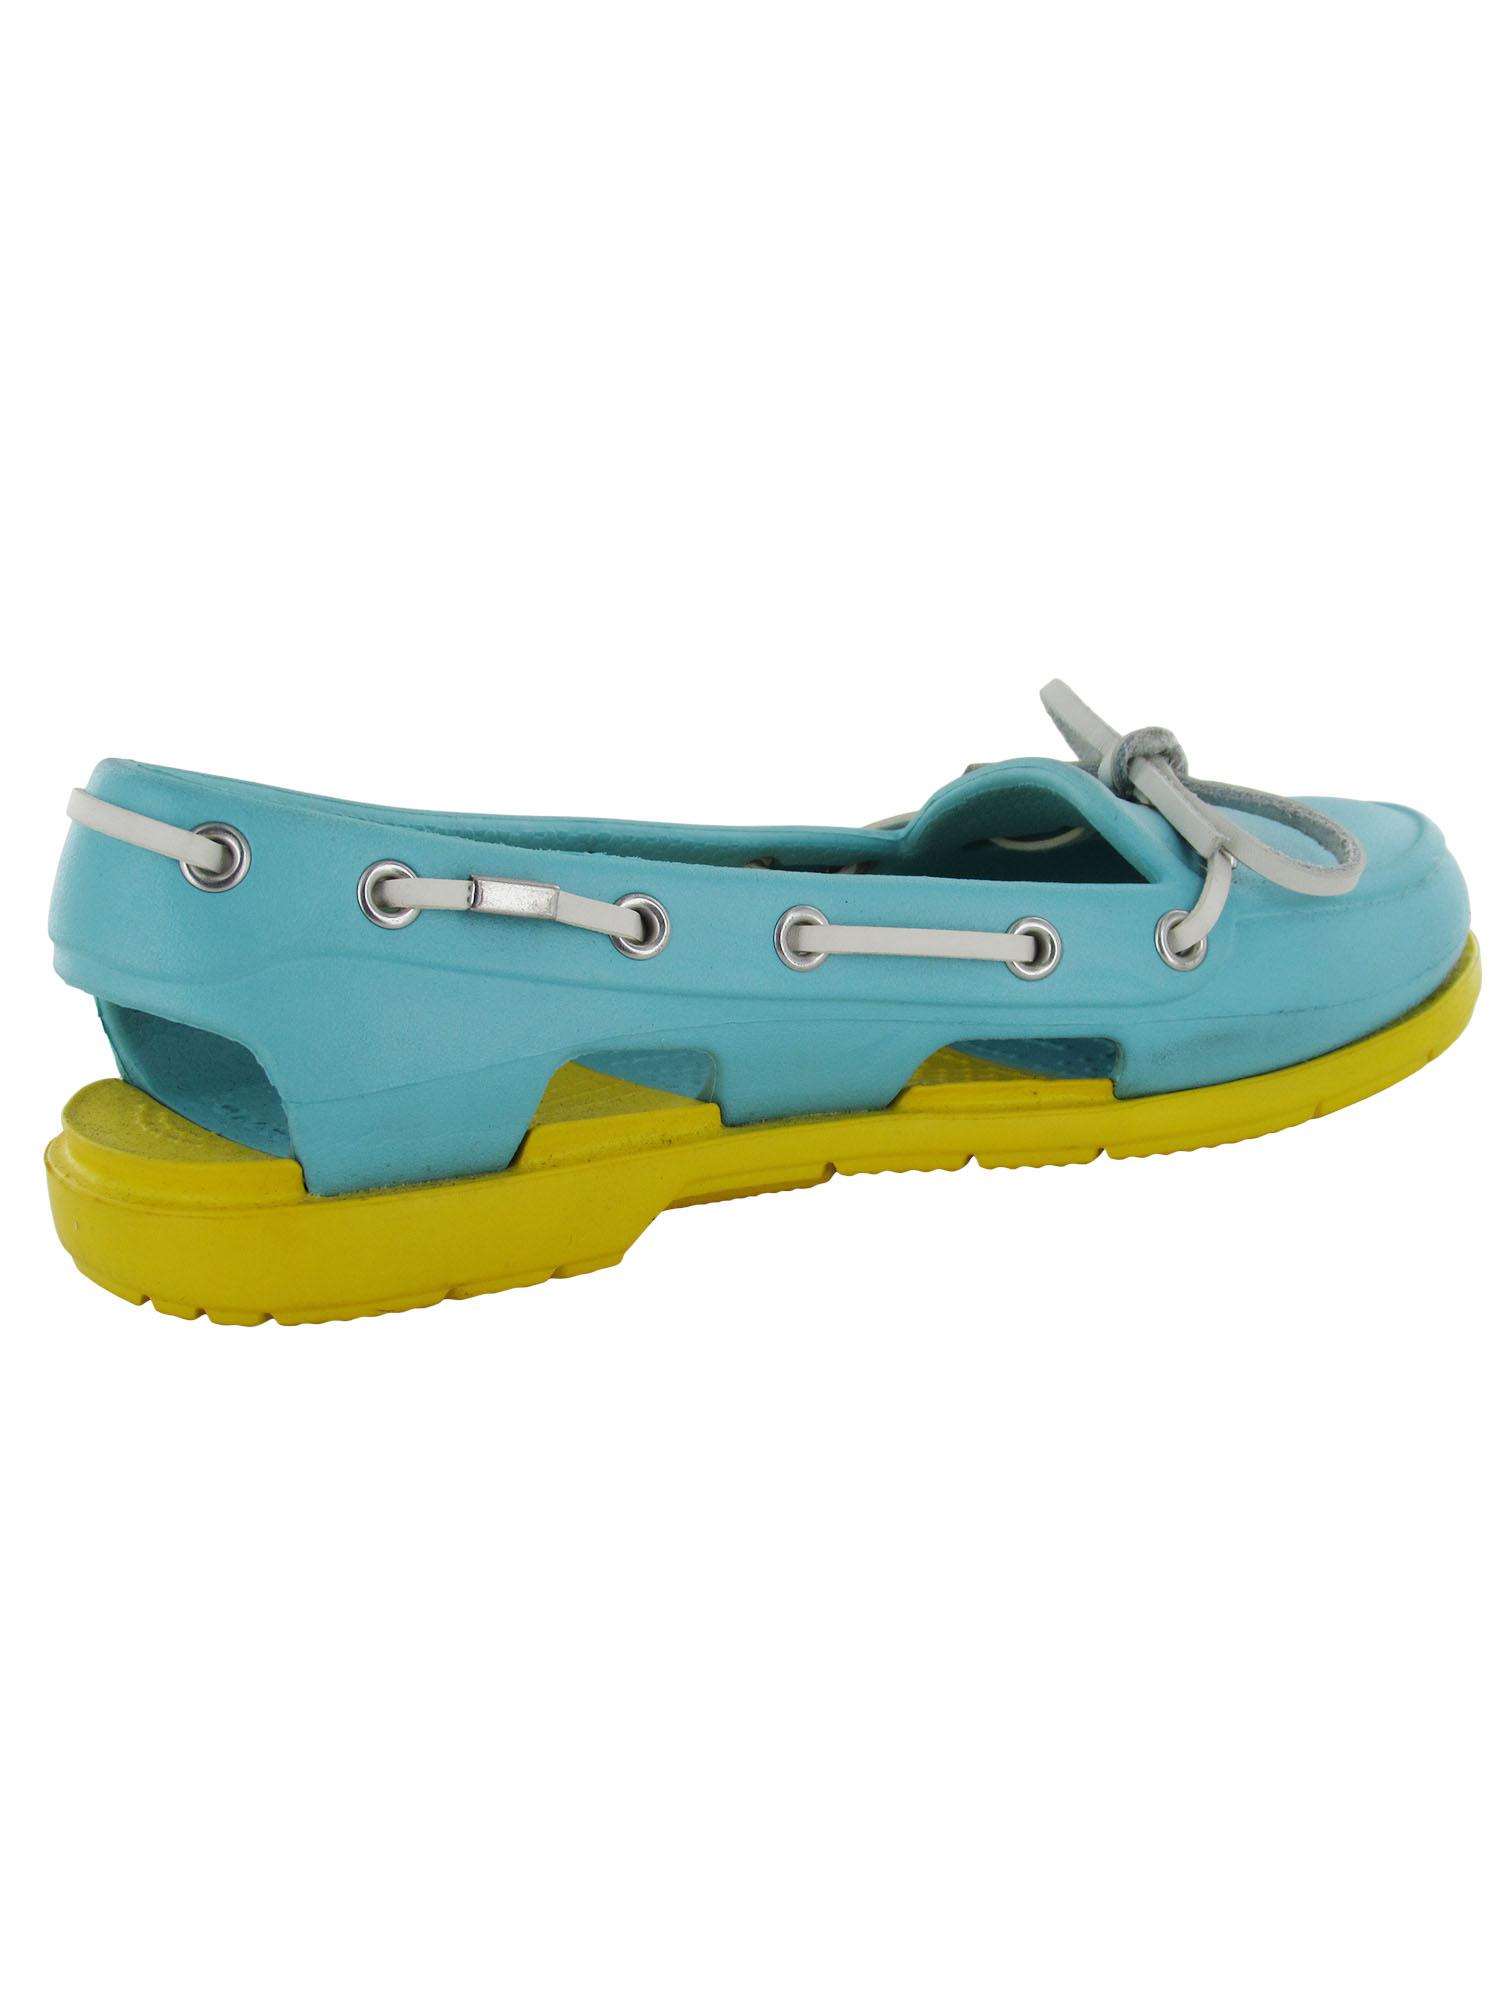 fb8ef2148 Crocs-Womens-Beach-Line-Slip-On-Boat-Shoes thumbnail